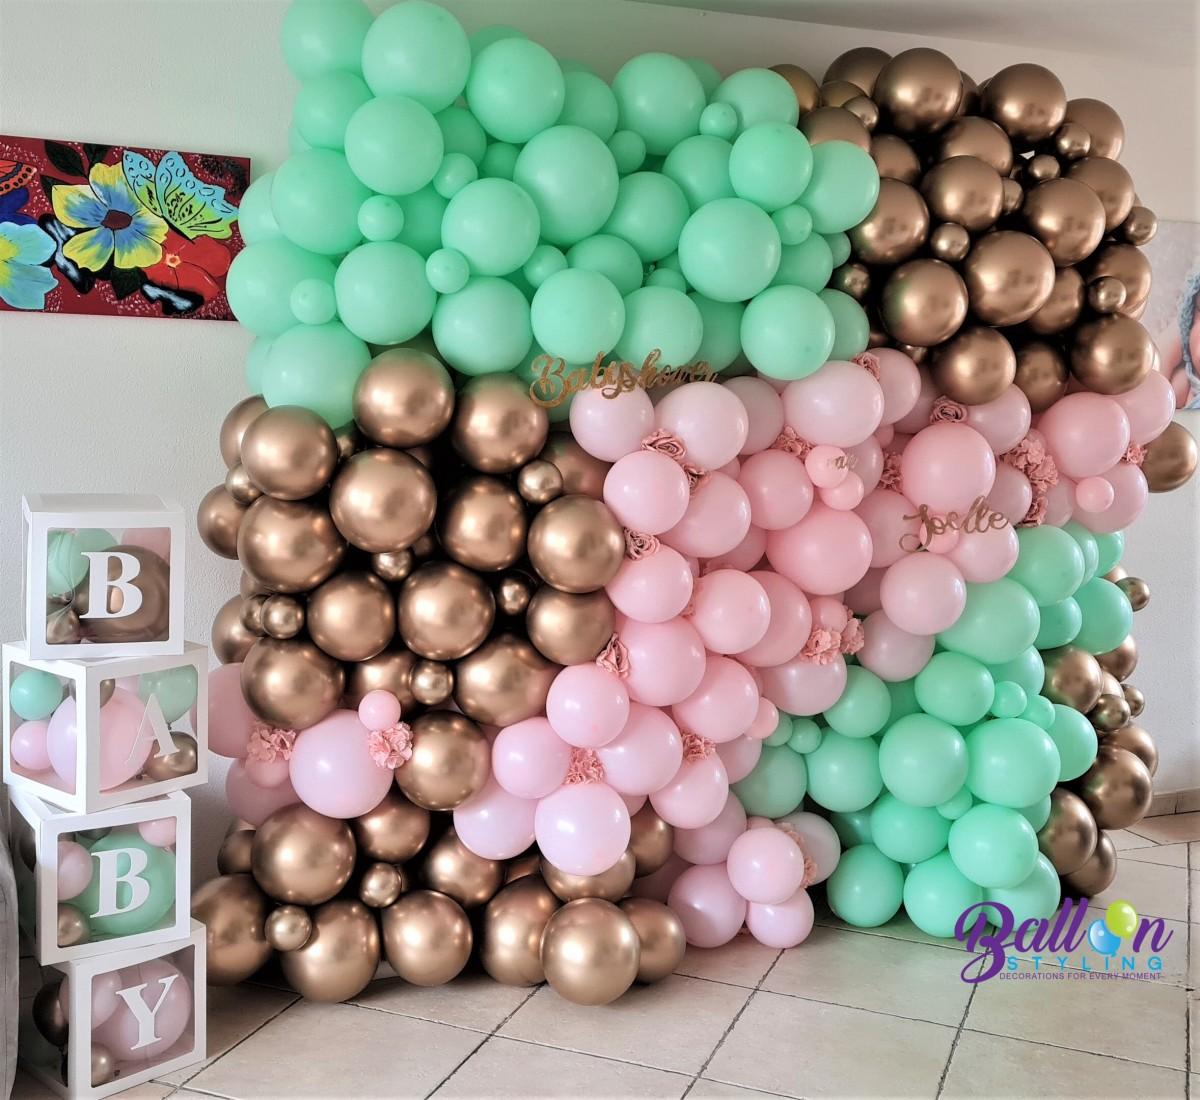 Balloon Styling Tilburg babyshower ballonnenmuur organic wall organic muur babydozen babyboxes zijden rozen bloemen ballonnen Tilburg (1)